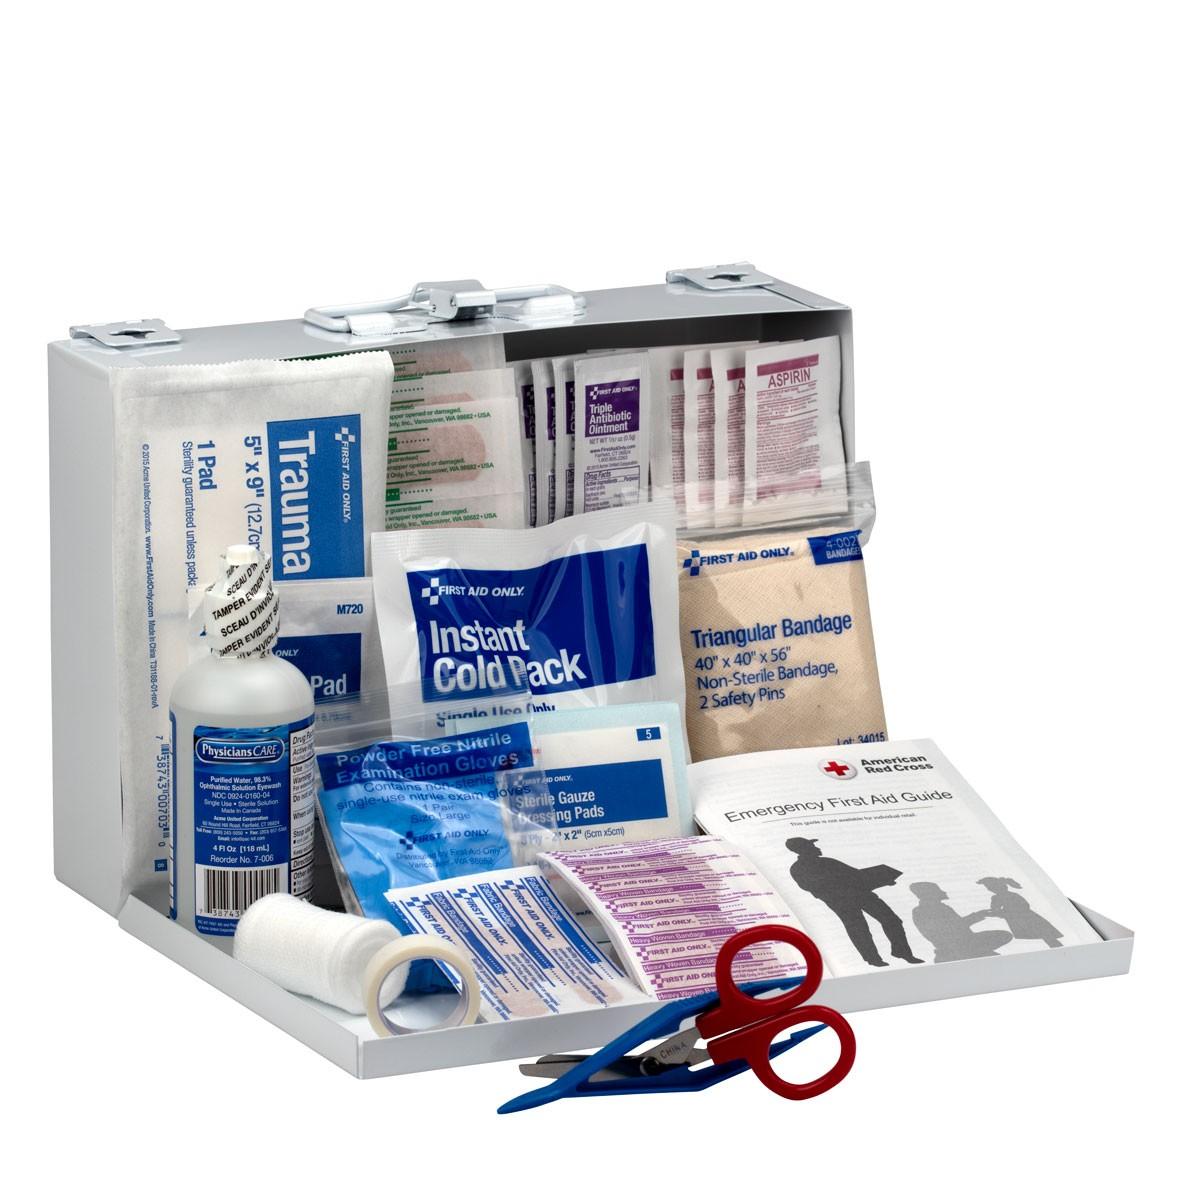 5a11c249d Supreme Medical Remotenet Login